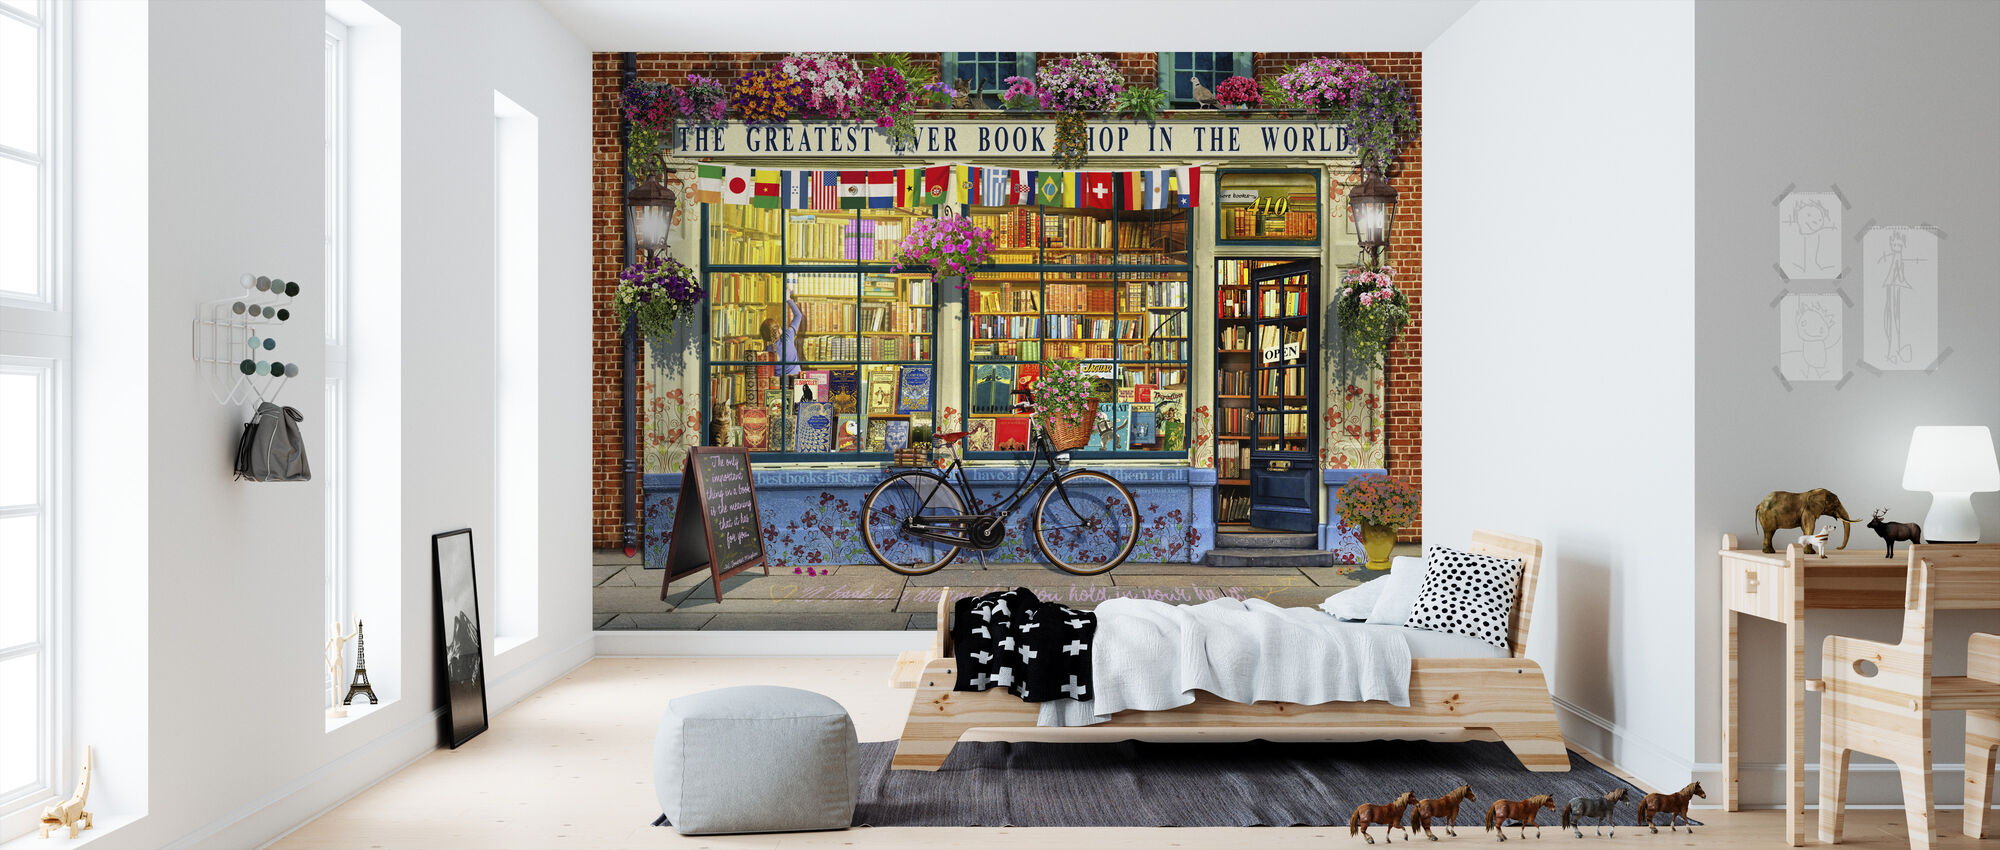 Greatest Bookshop In The World - Wallpaper - Kids Room